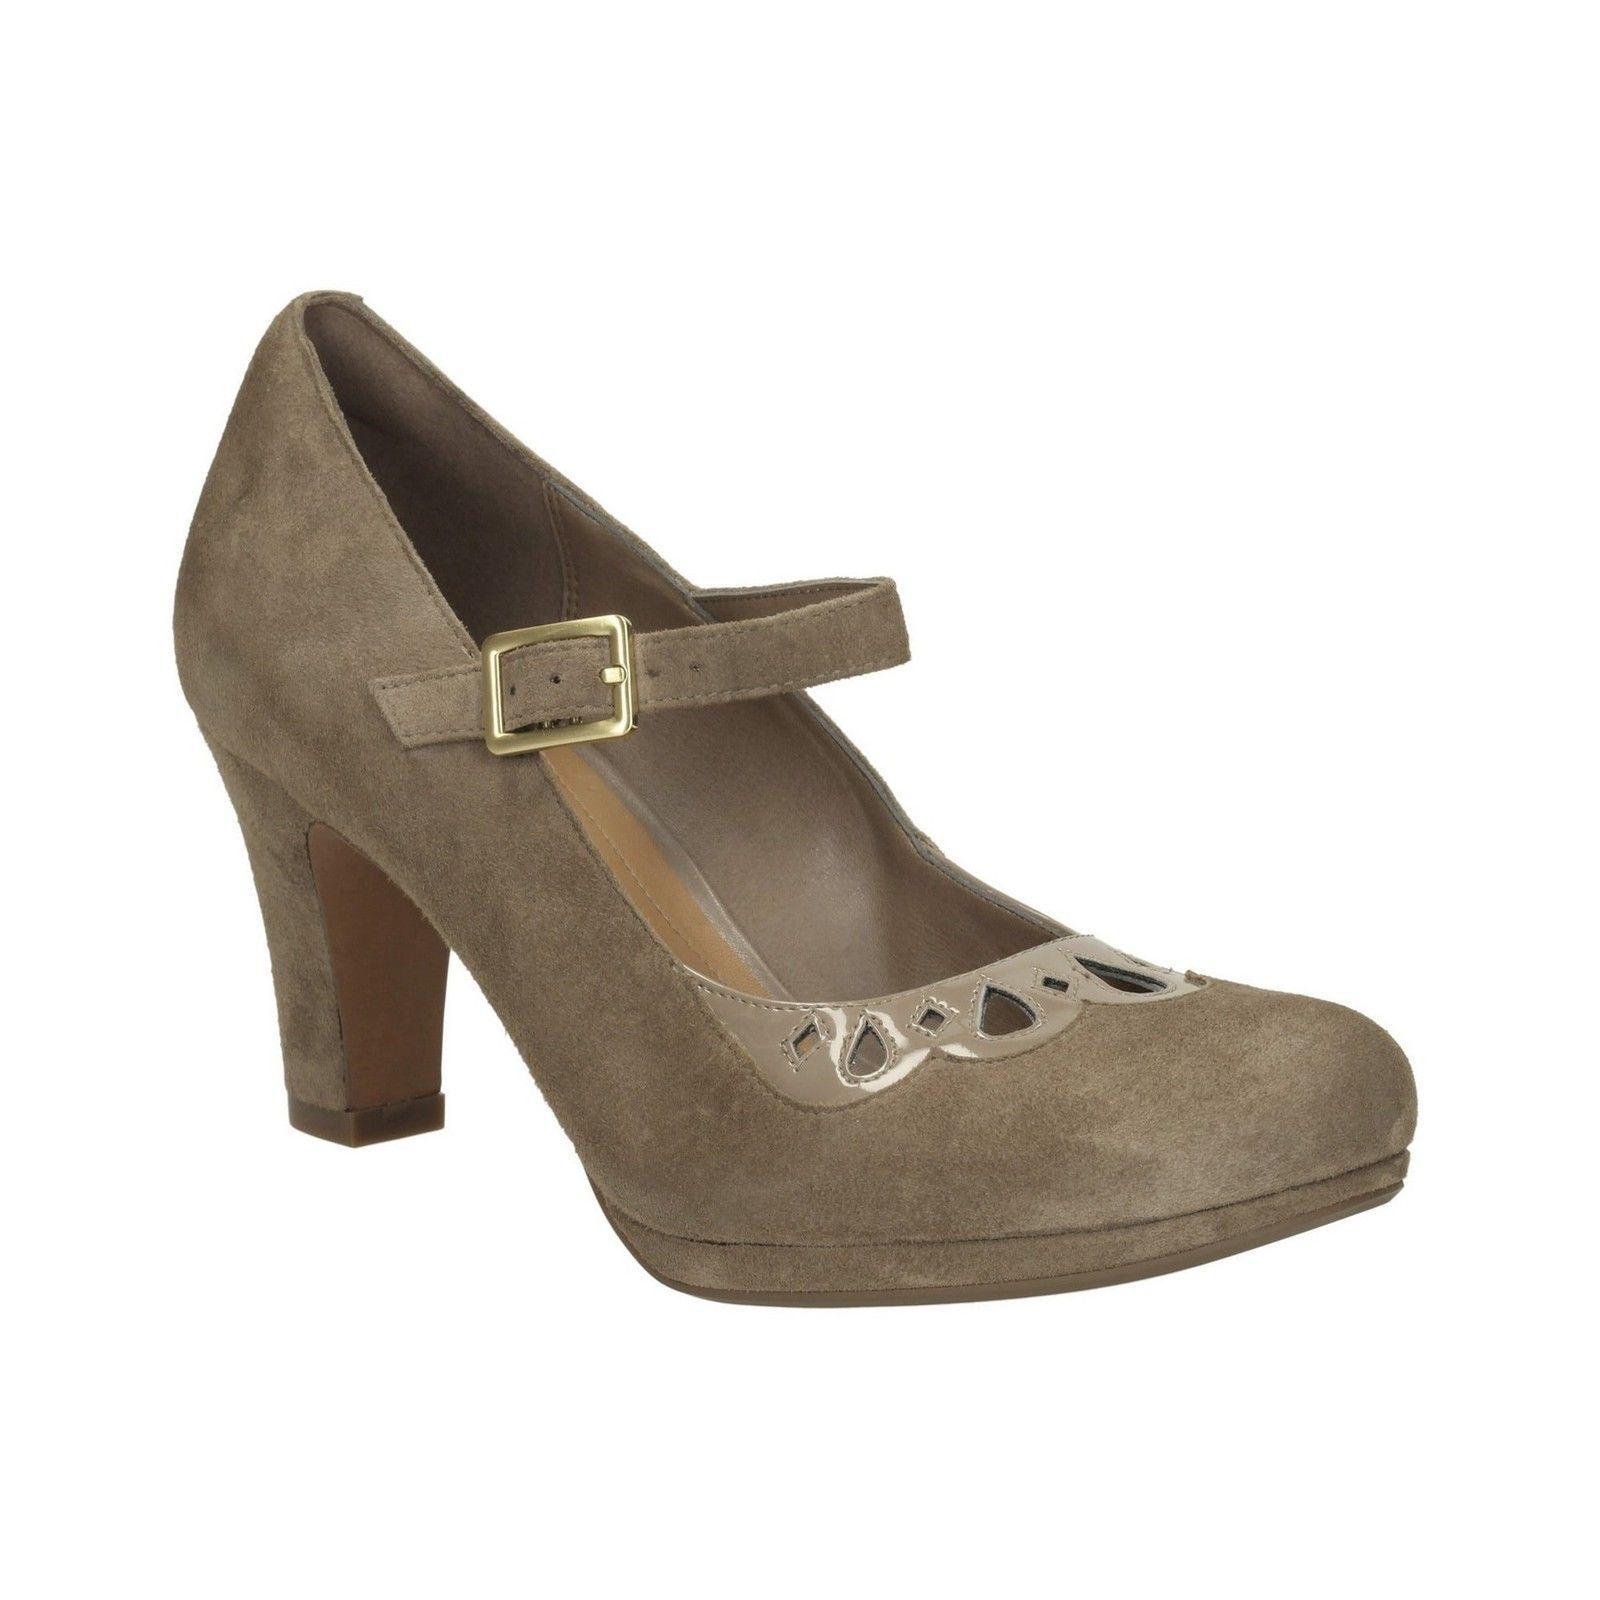 Damas Clarks Zapatos Tribunal música de coro de gamuza Guijarro